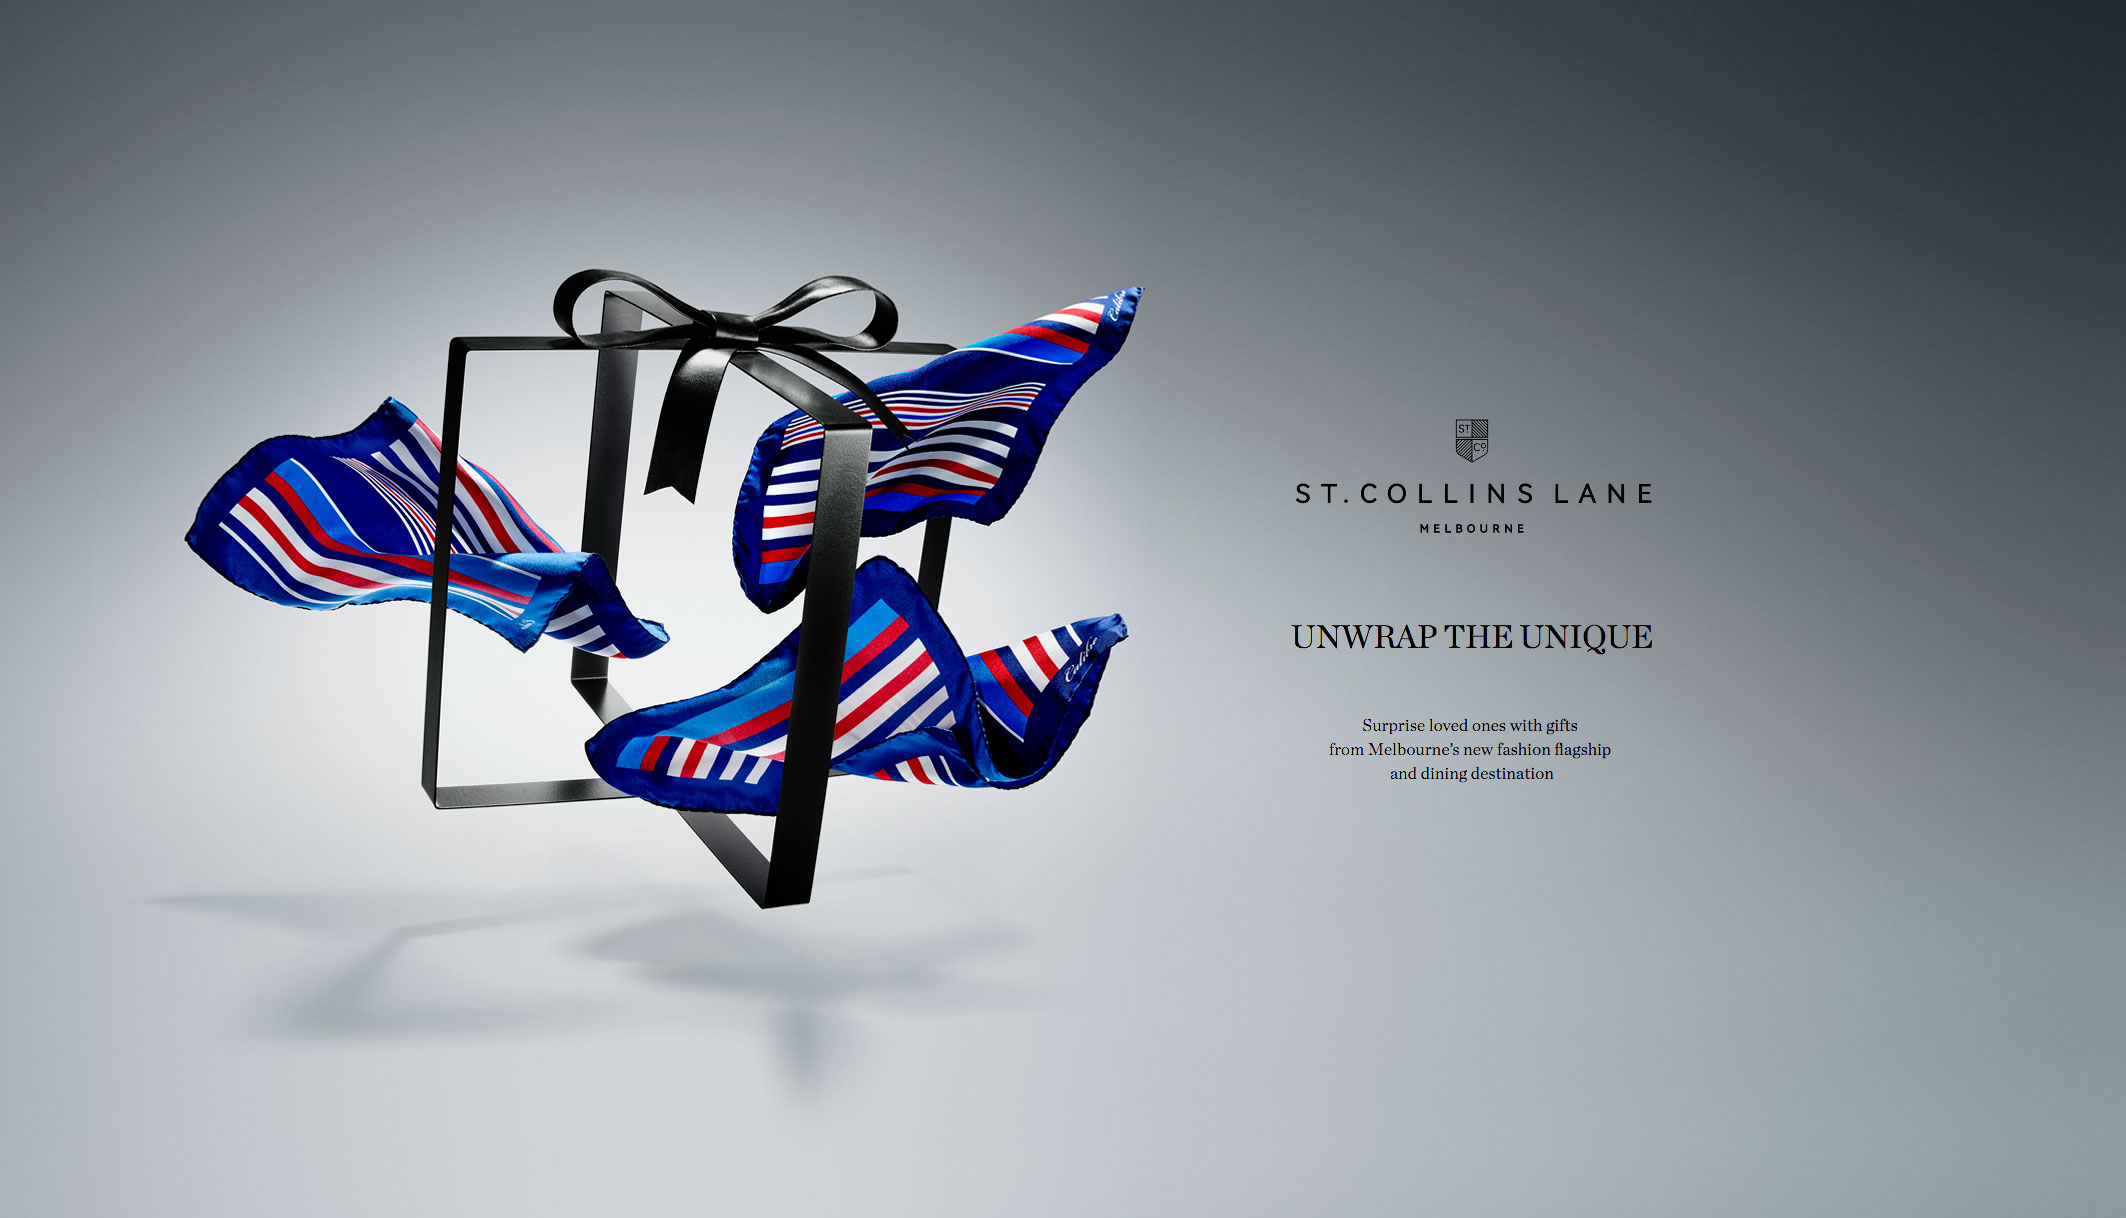 St. Collins Lane